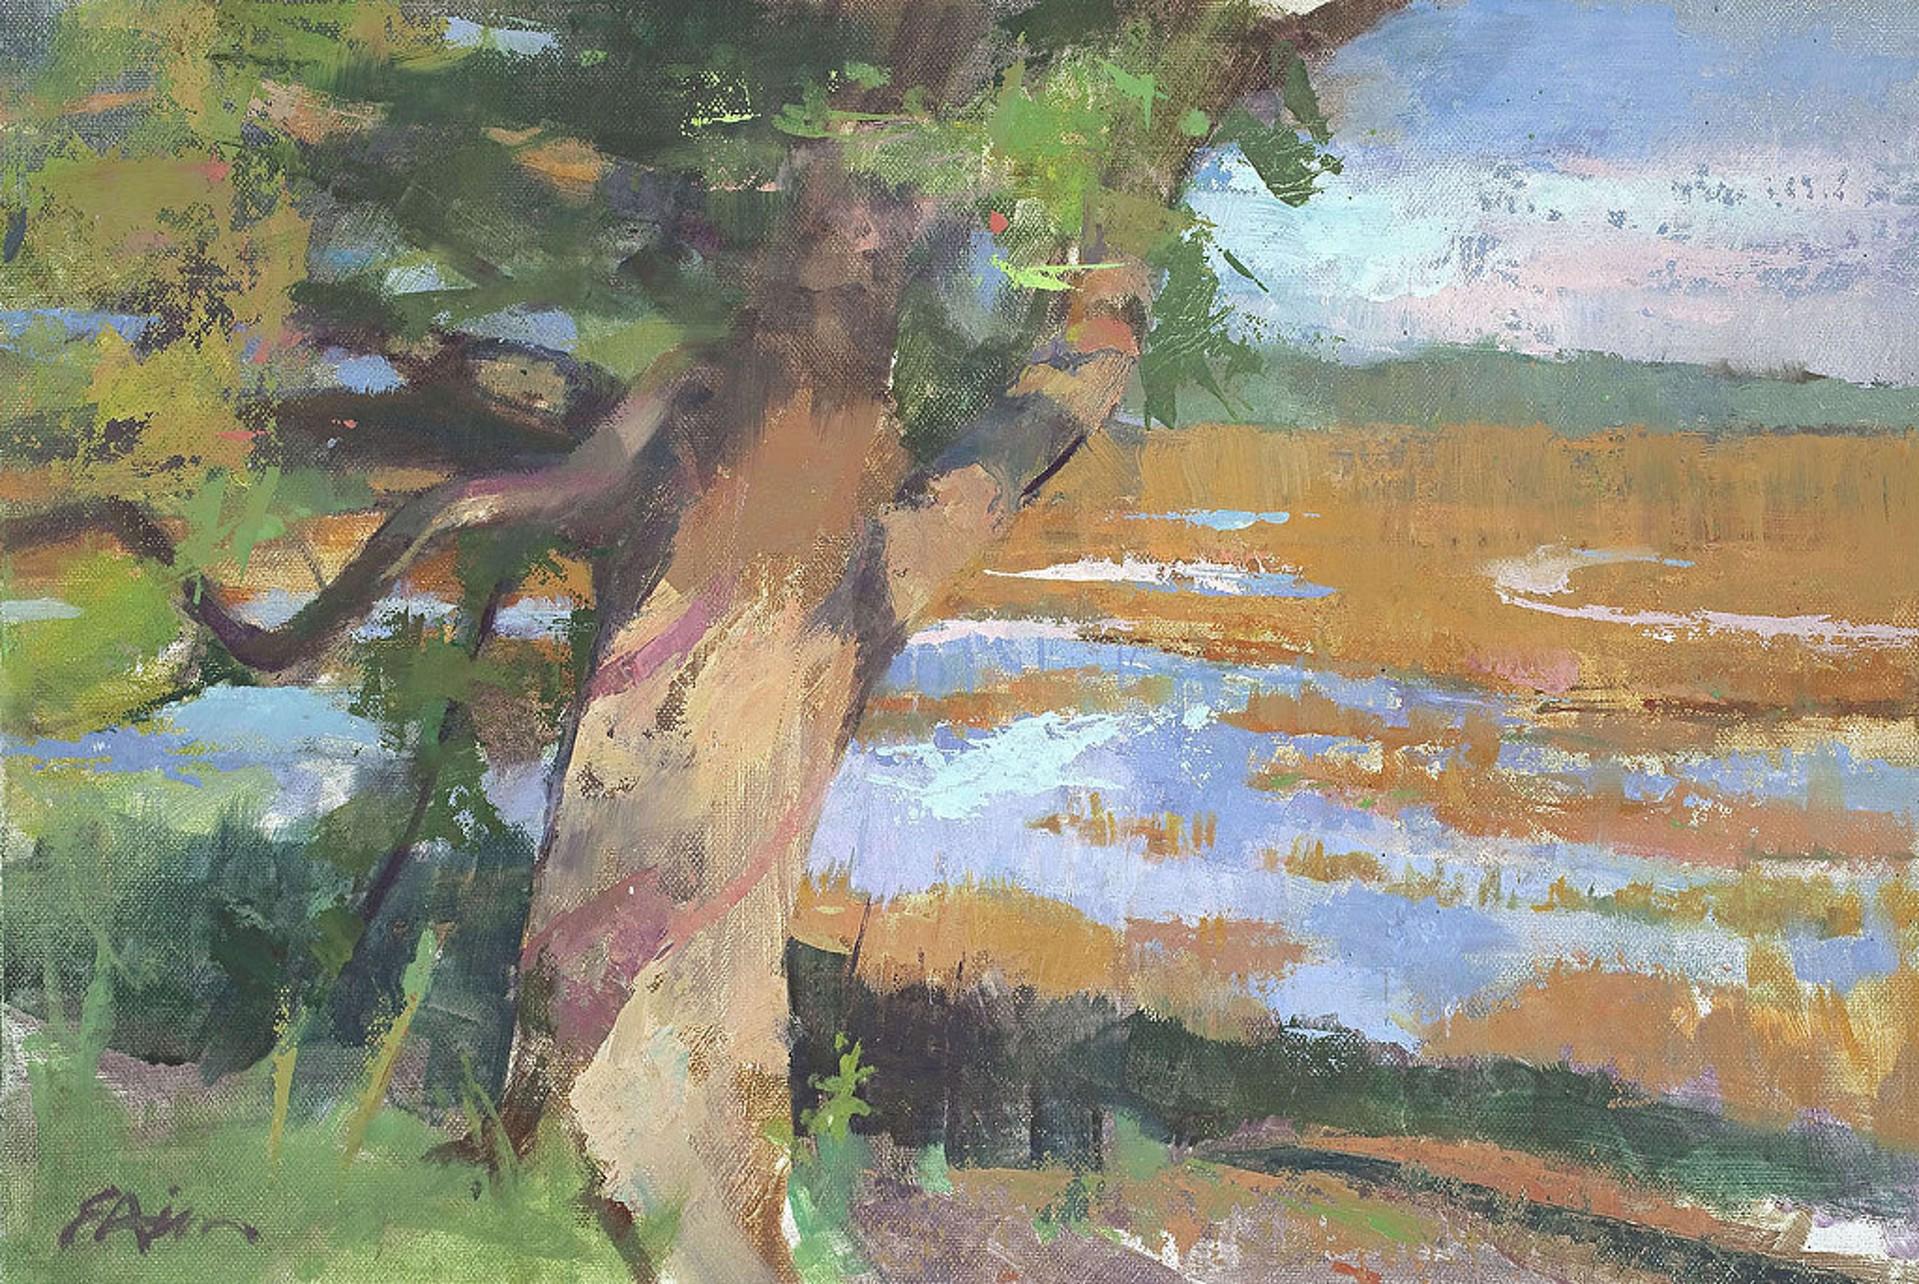 Chamisa at Noon by Emily Hirn